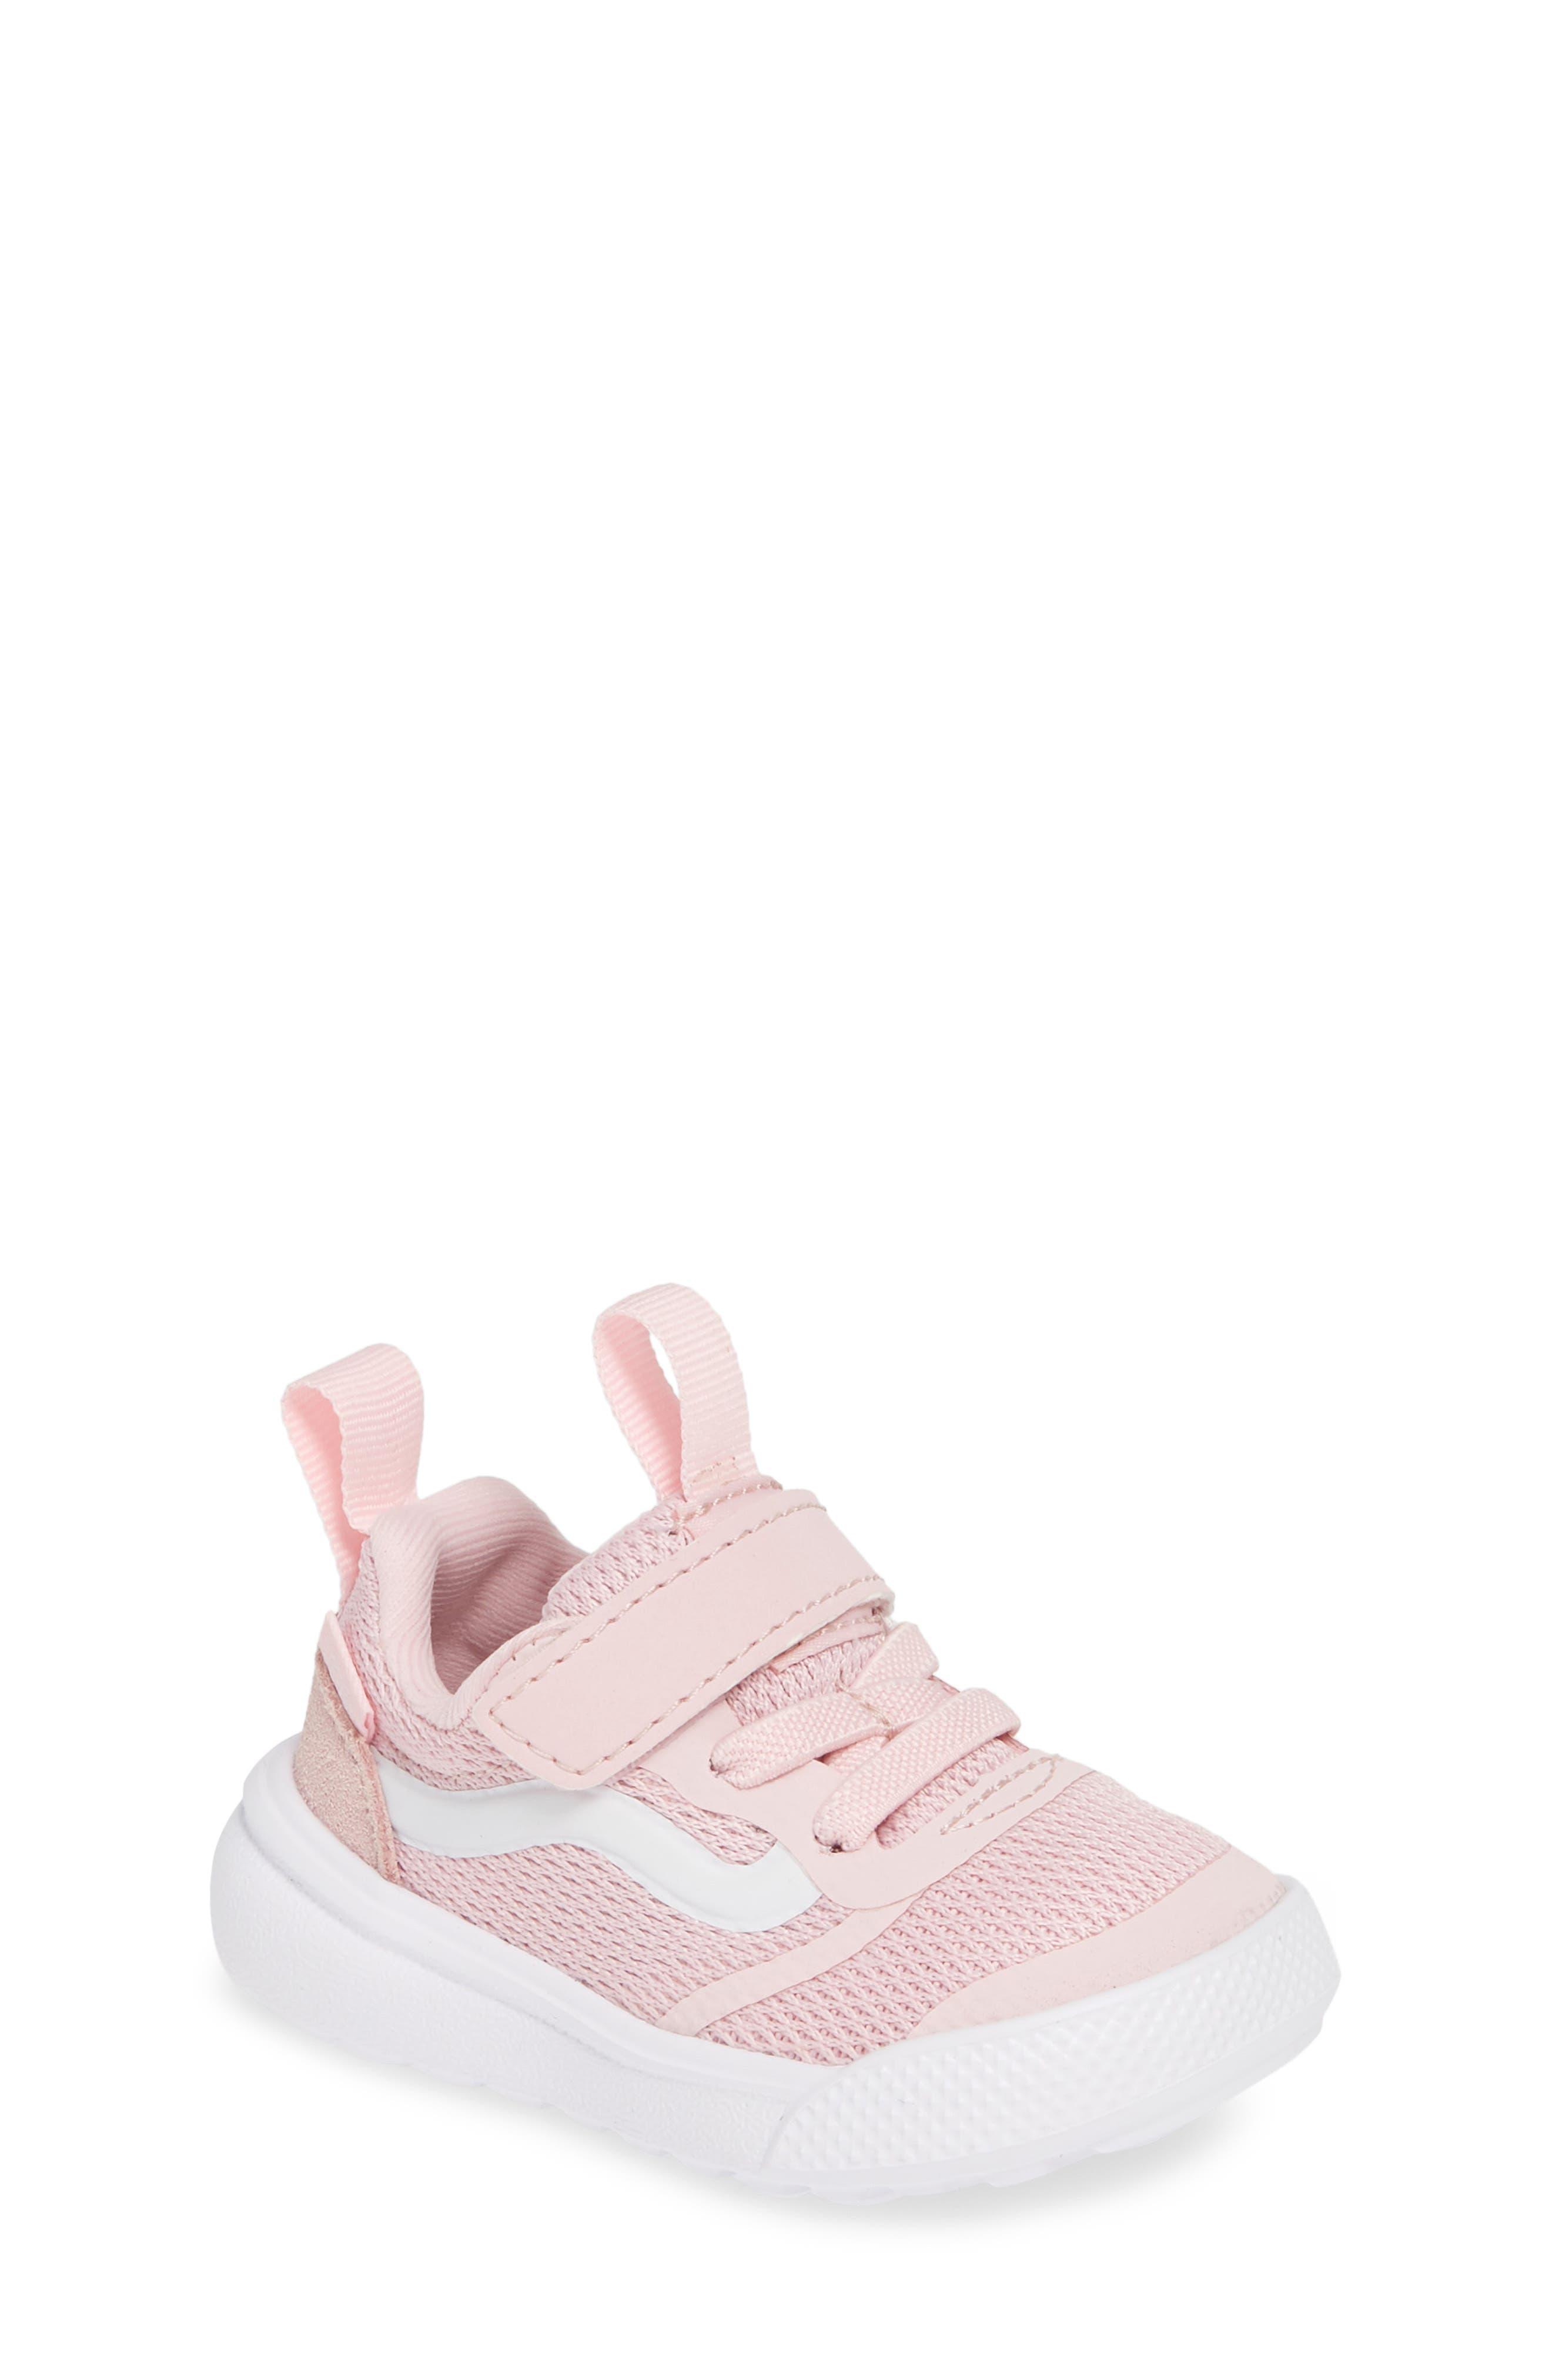 Toddler Girls Vans Ultrarange Rapidweld Sneaker Size 12 M  Pink